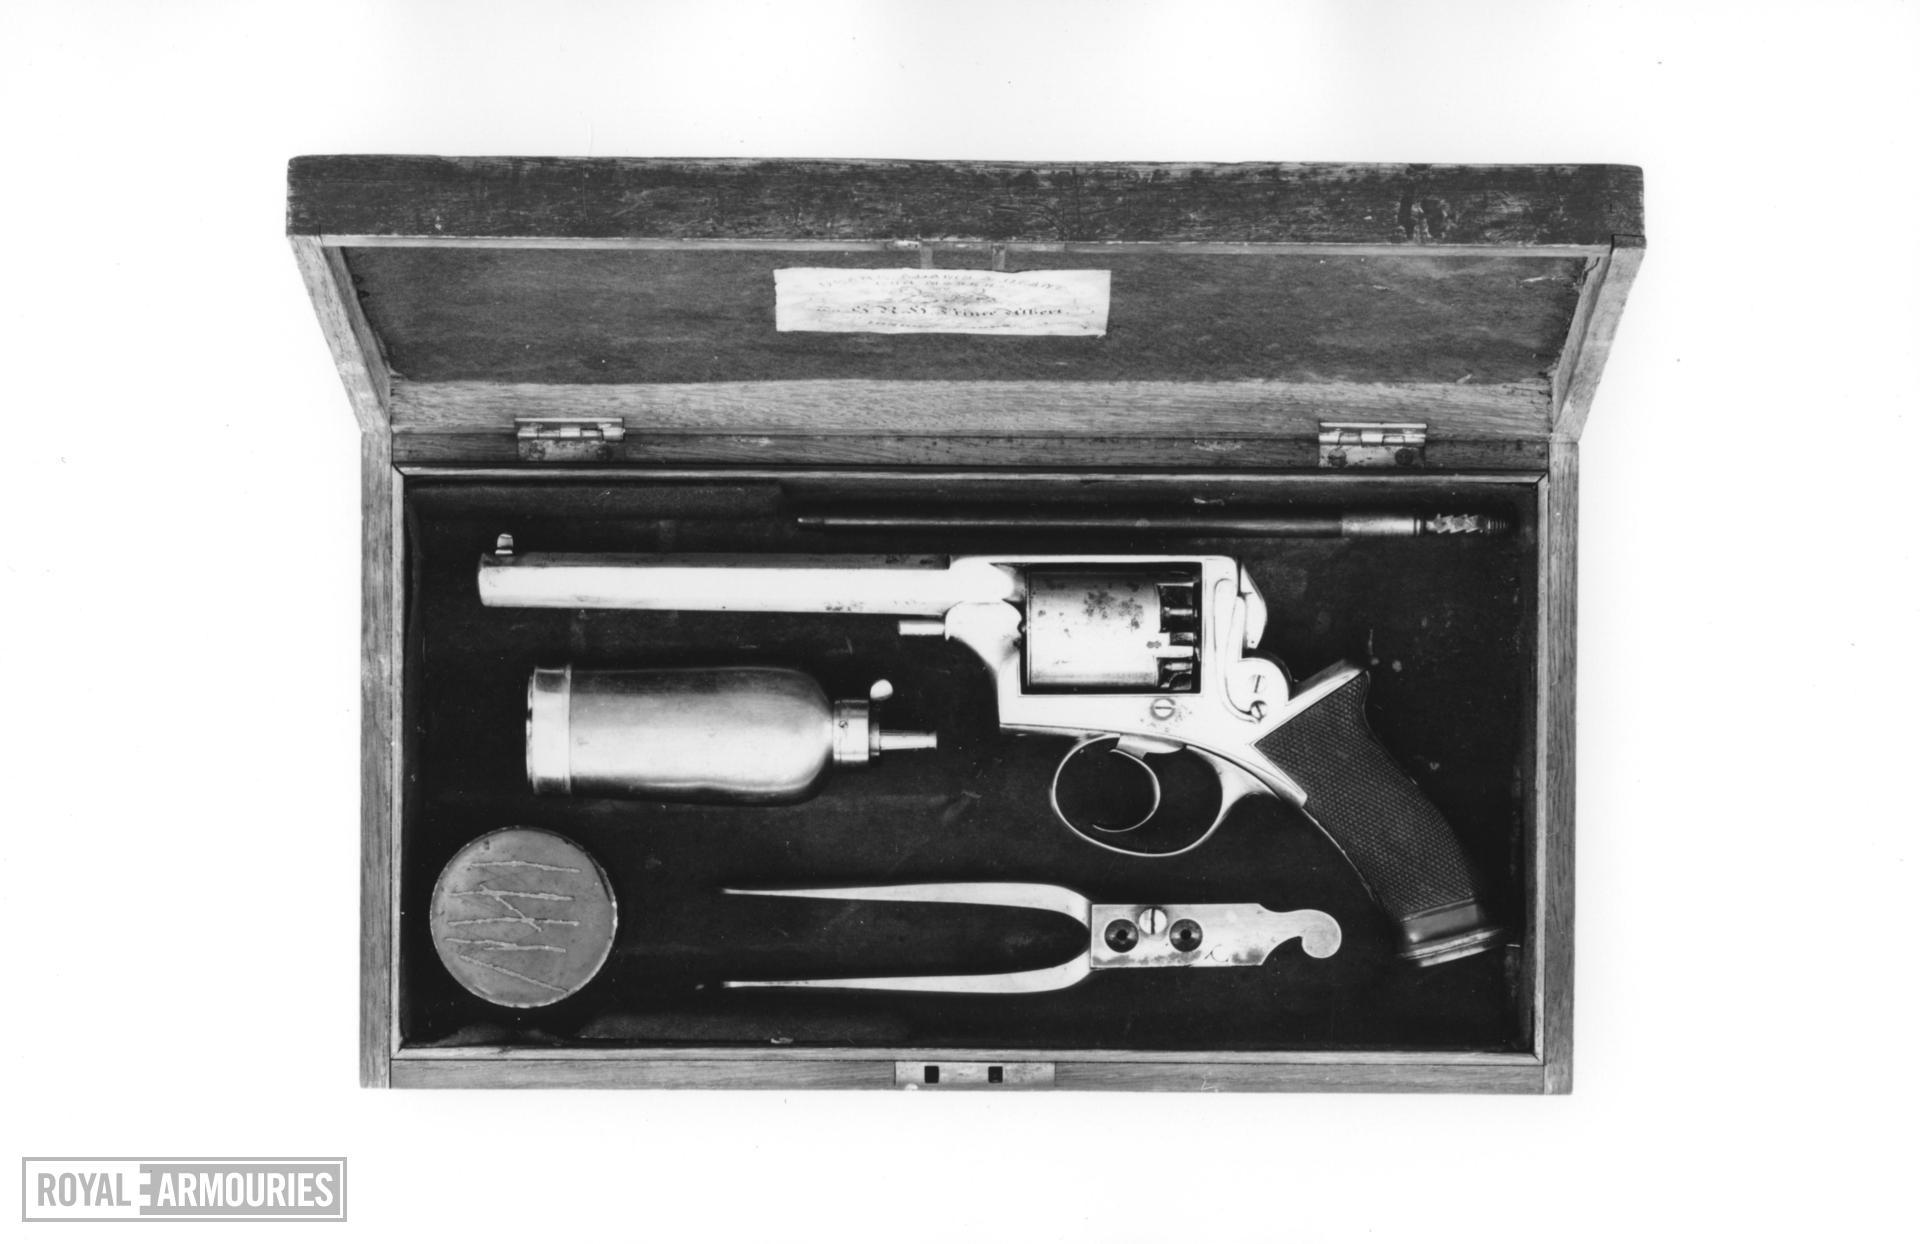 Percussion five-shot revolver - Deane Adams and Deane Model 1851 Cased